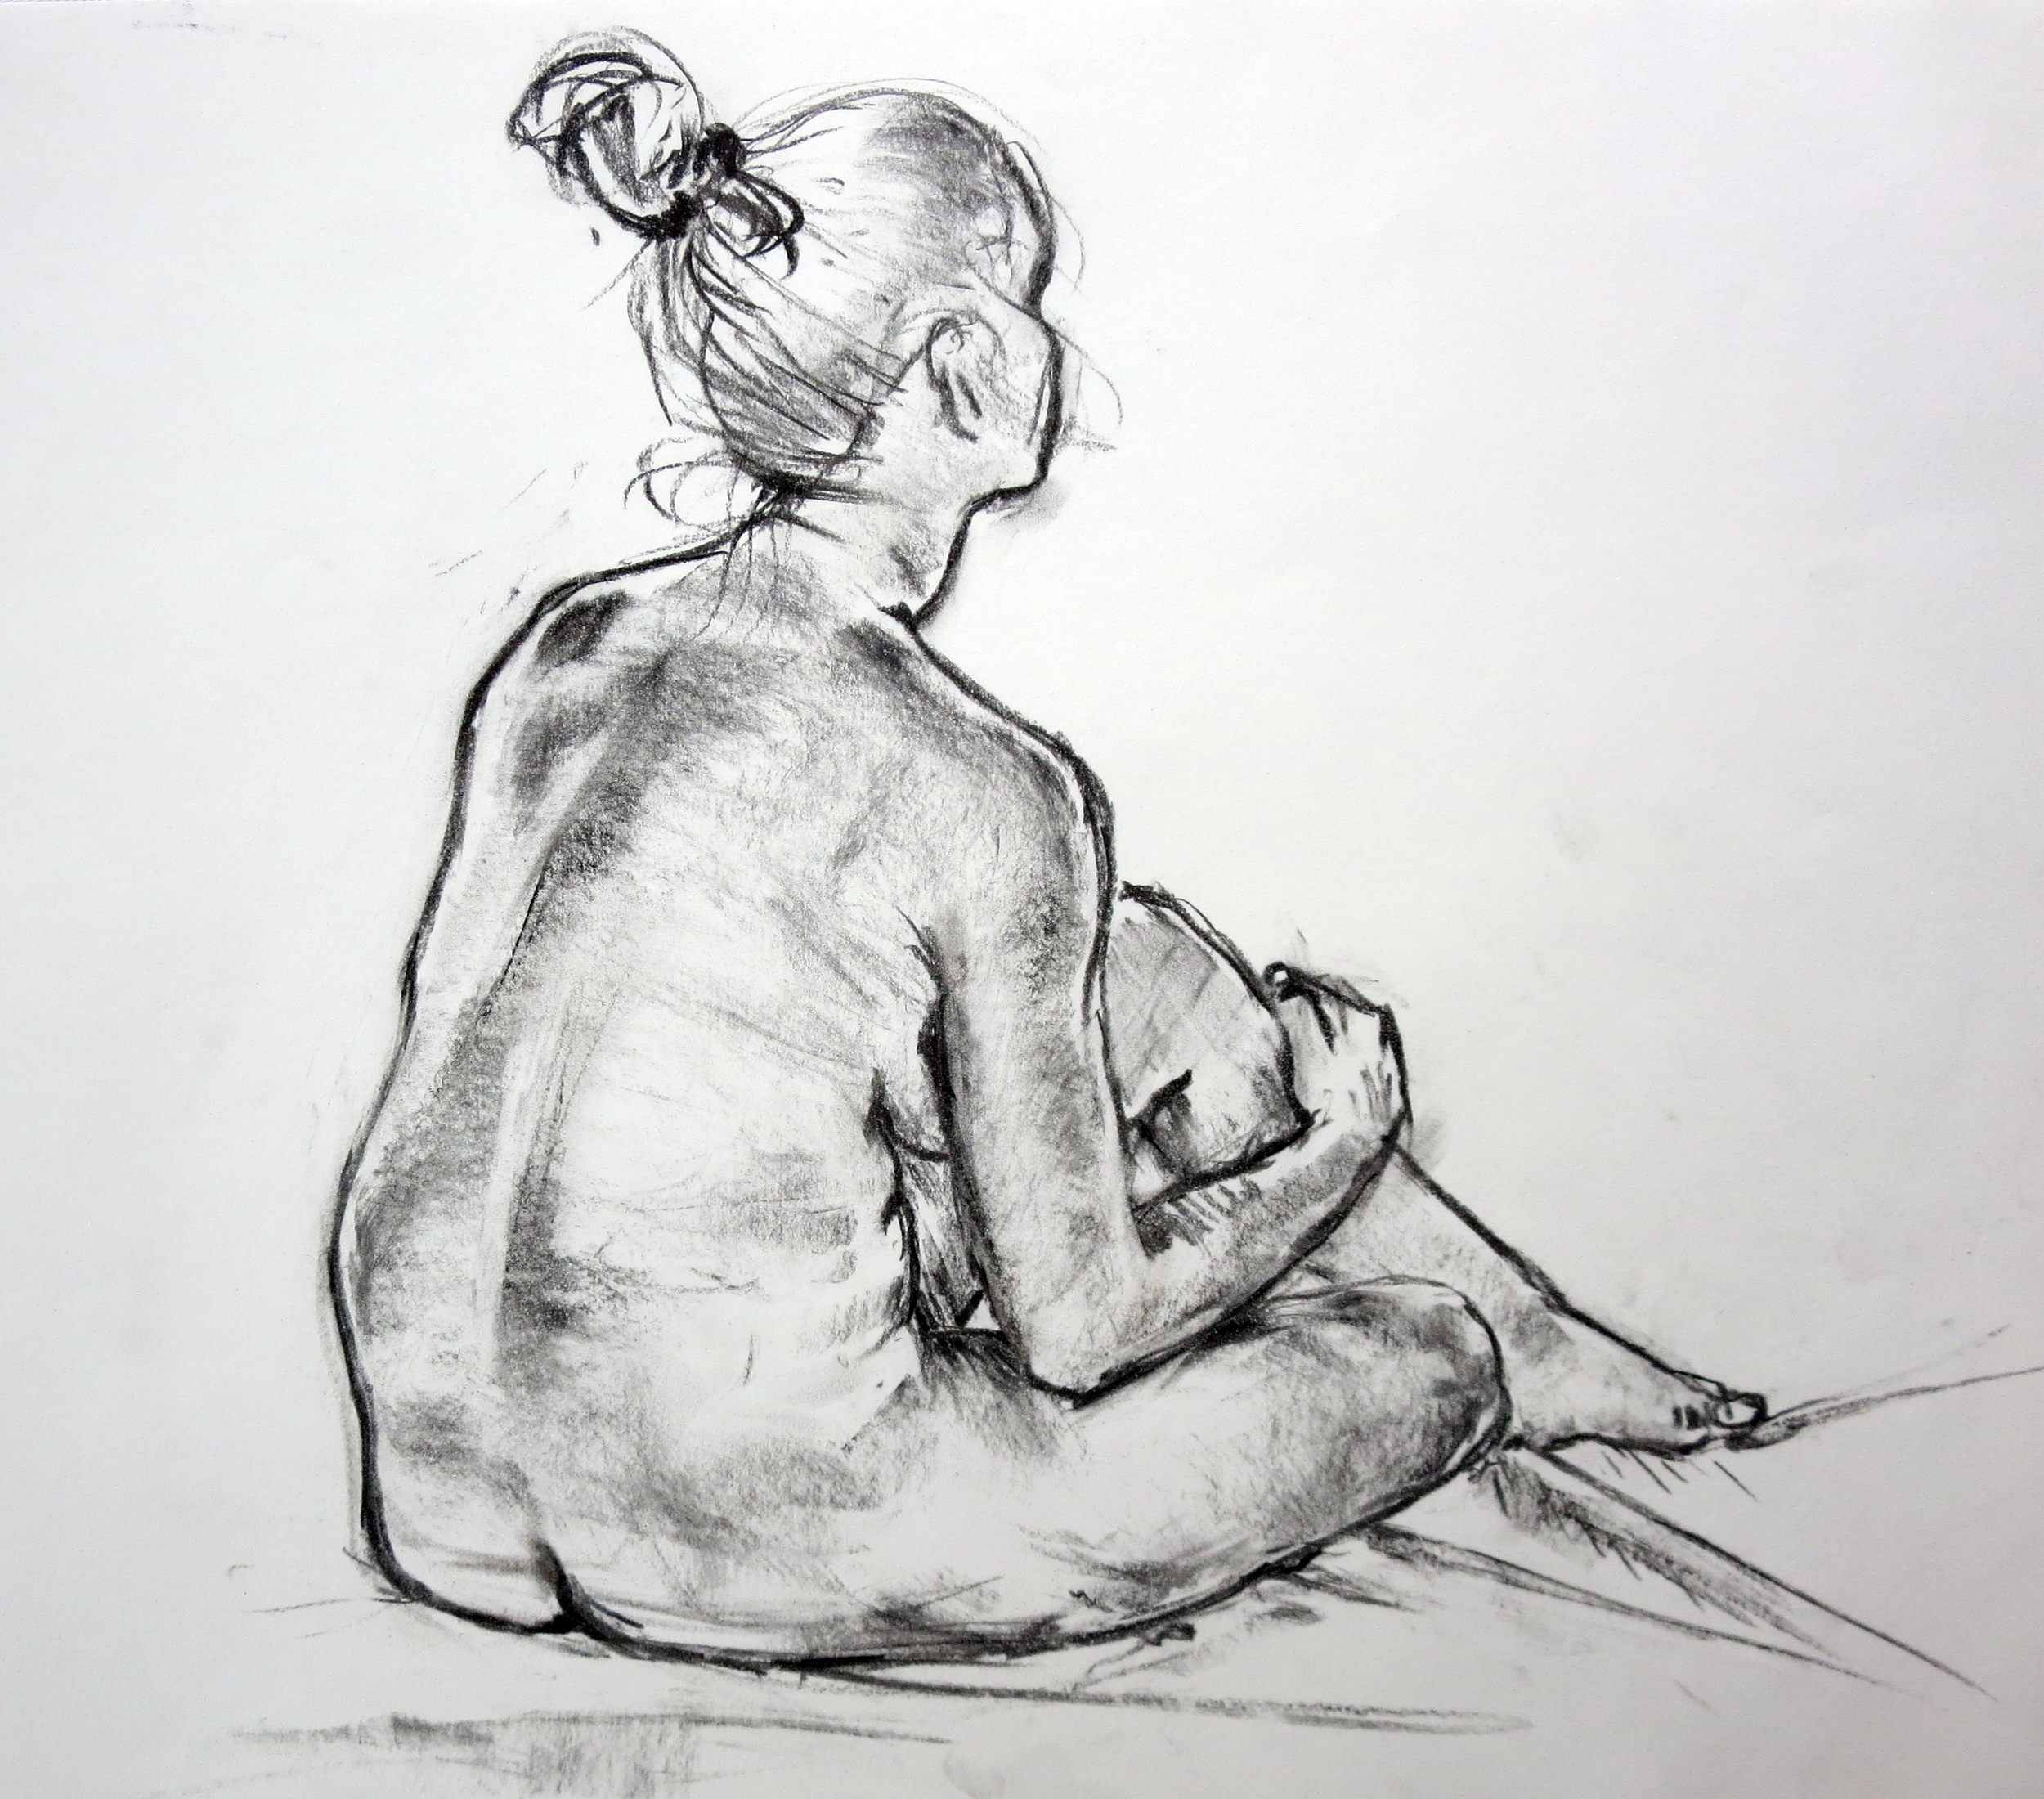 figure drawing study charcoal  ~20min  2014